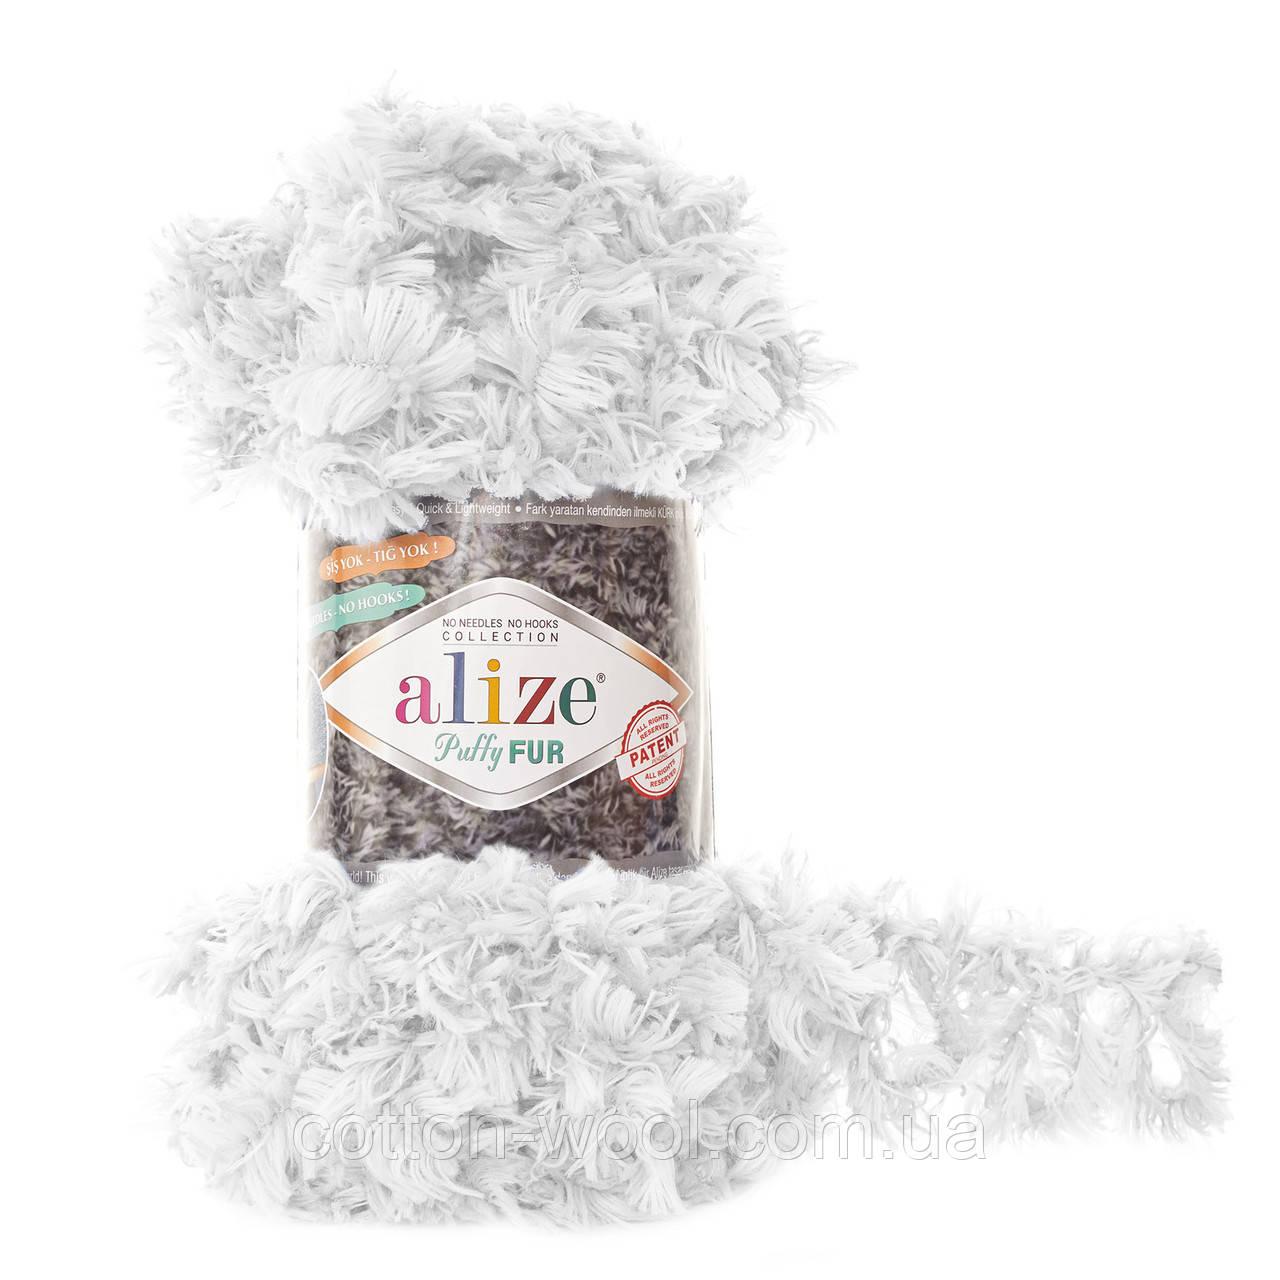 Puffy Fur (Паффі Фур) (100% - поліестер) 6100